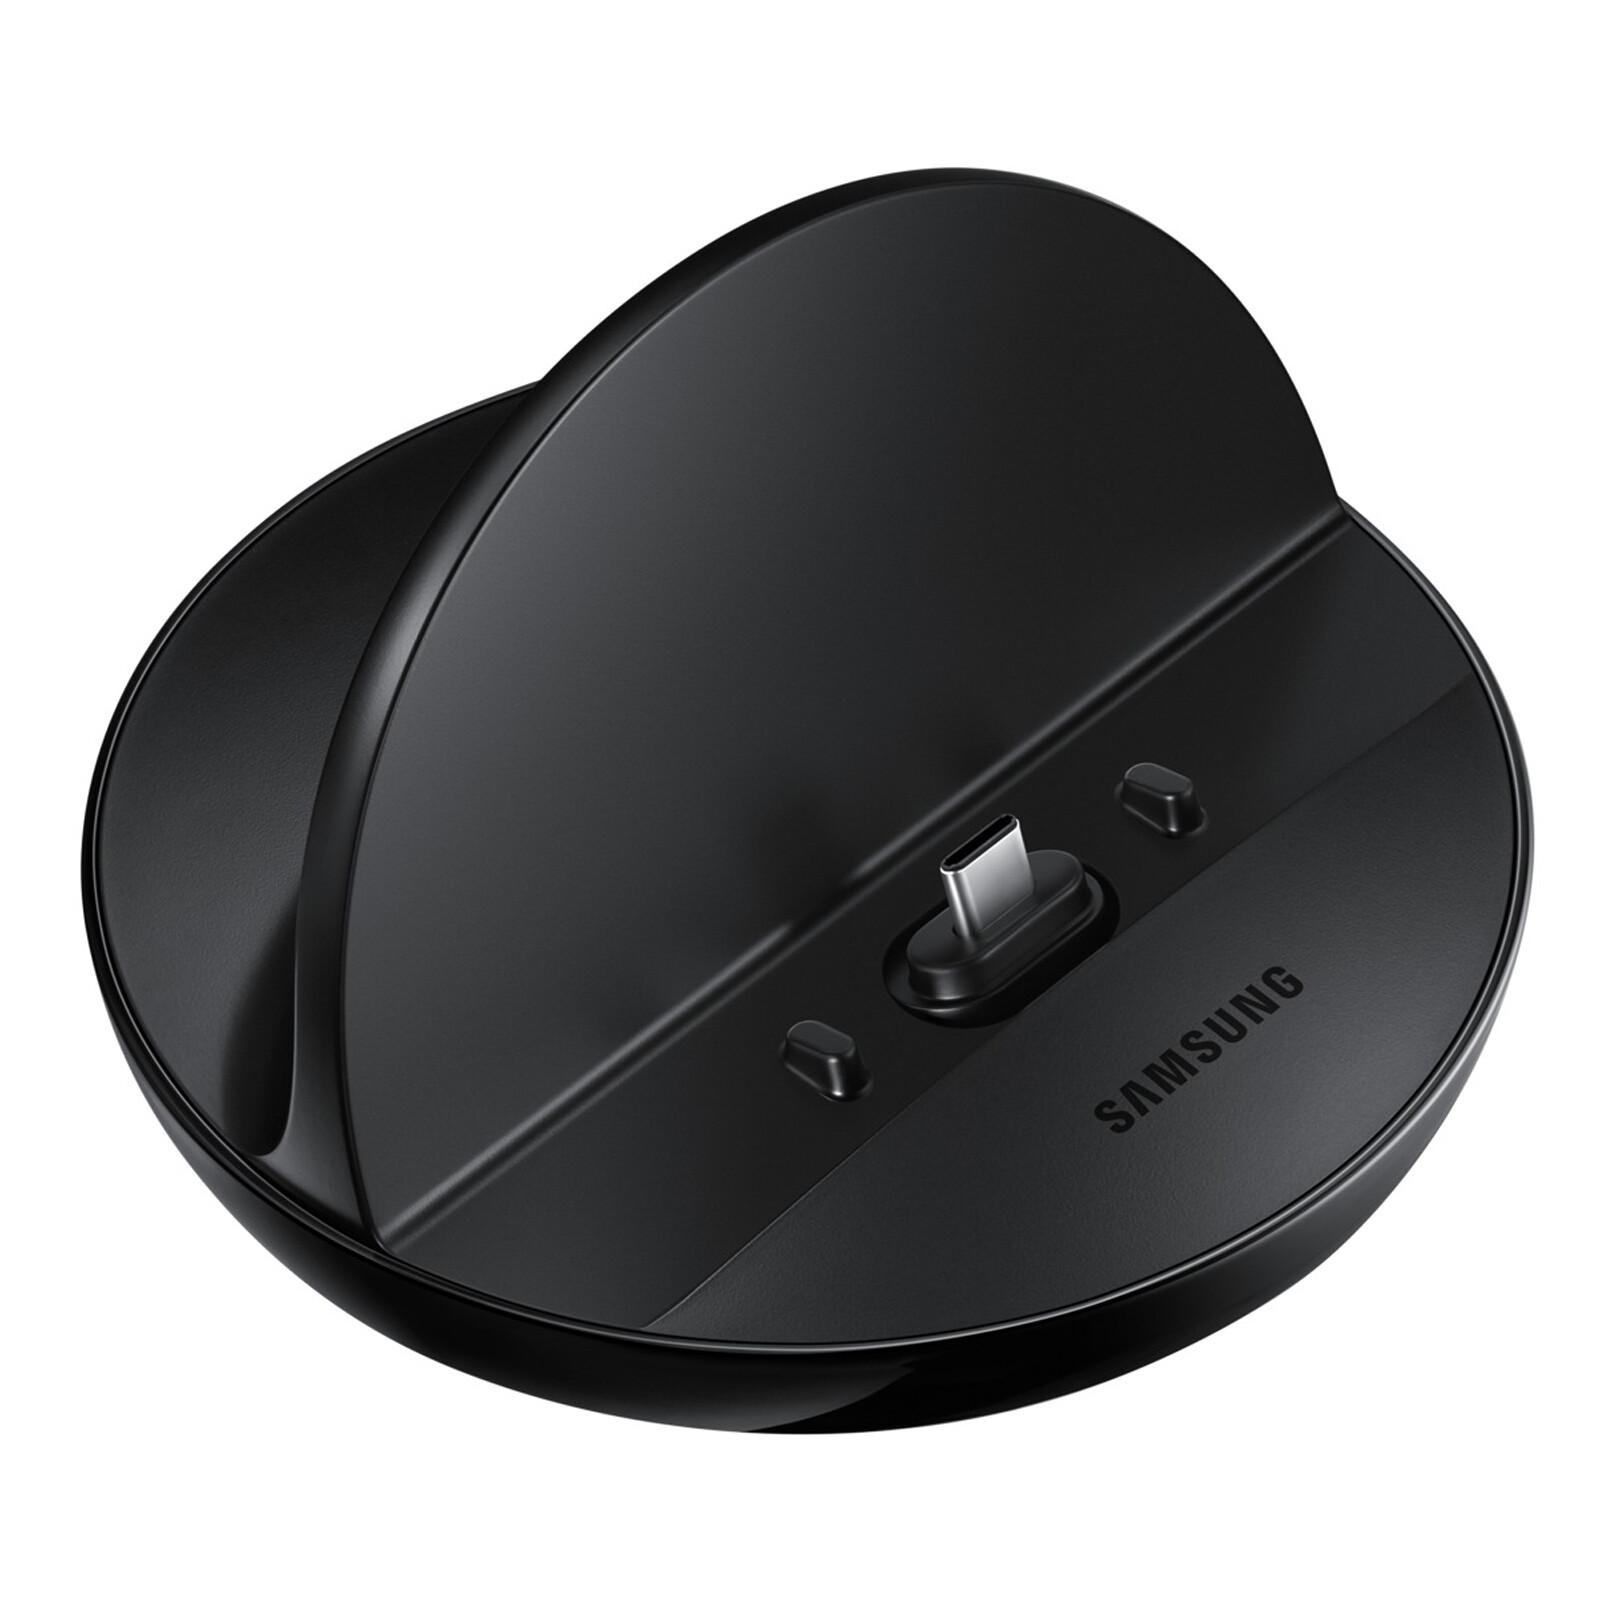 Samsung Lade-/Charging Dock mit USB-C